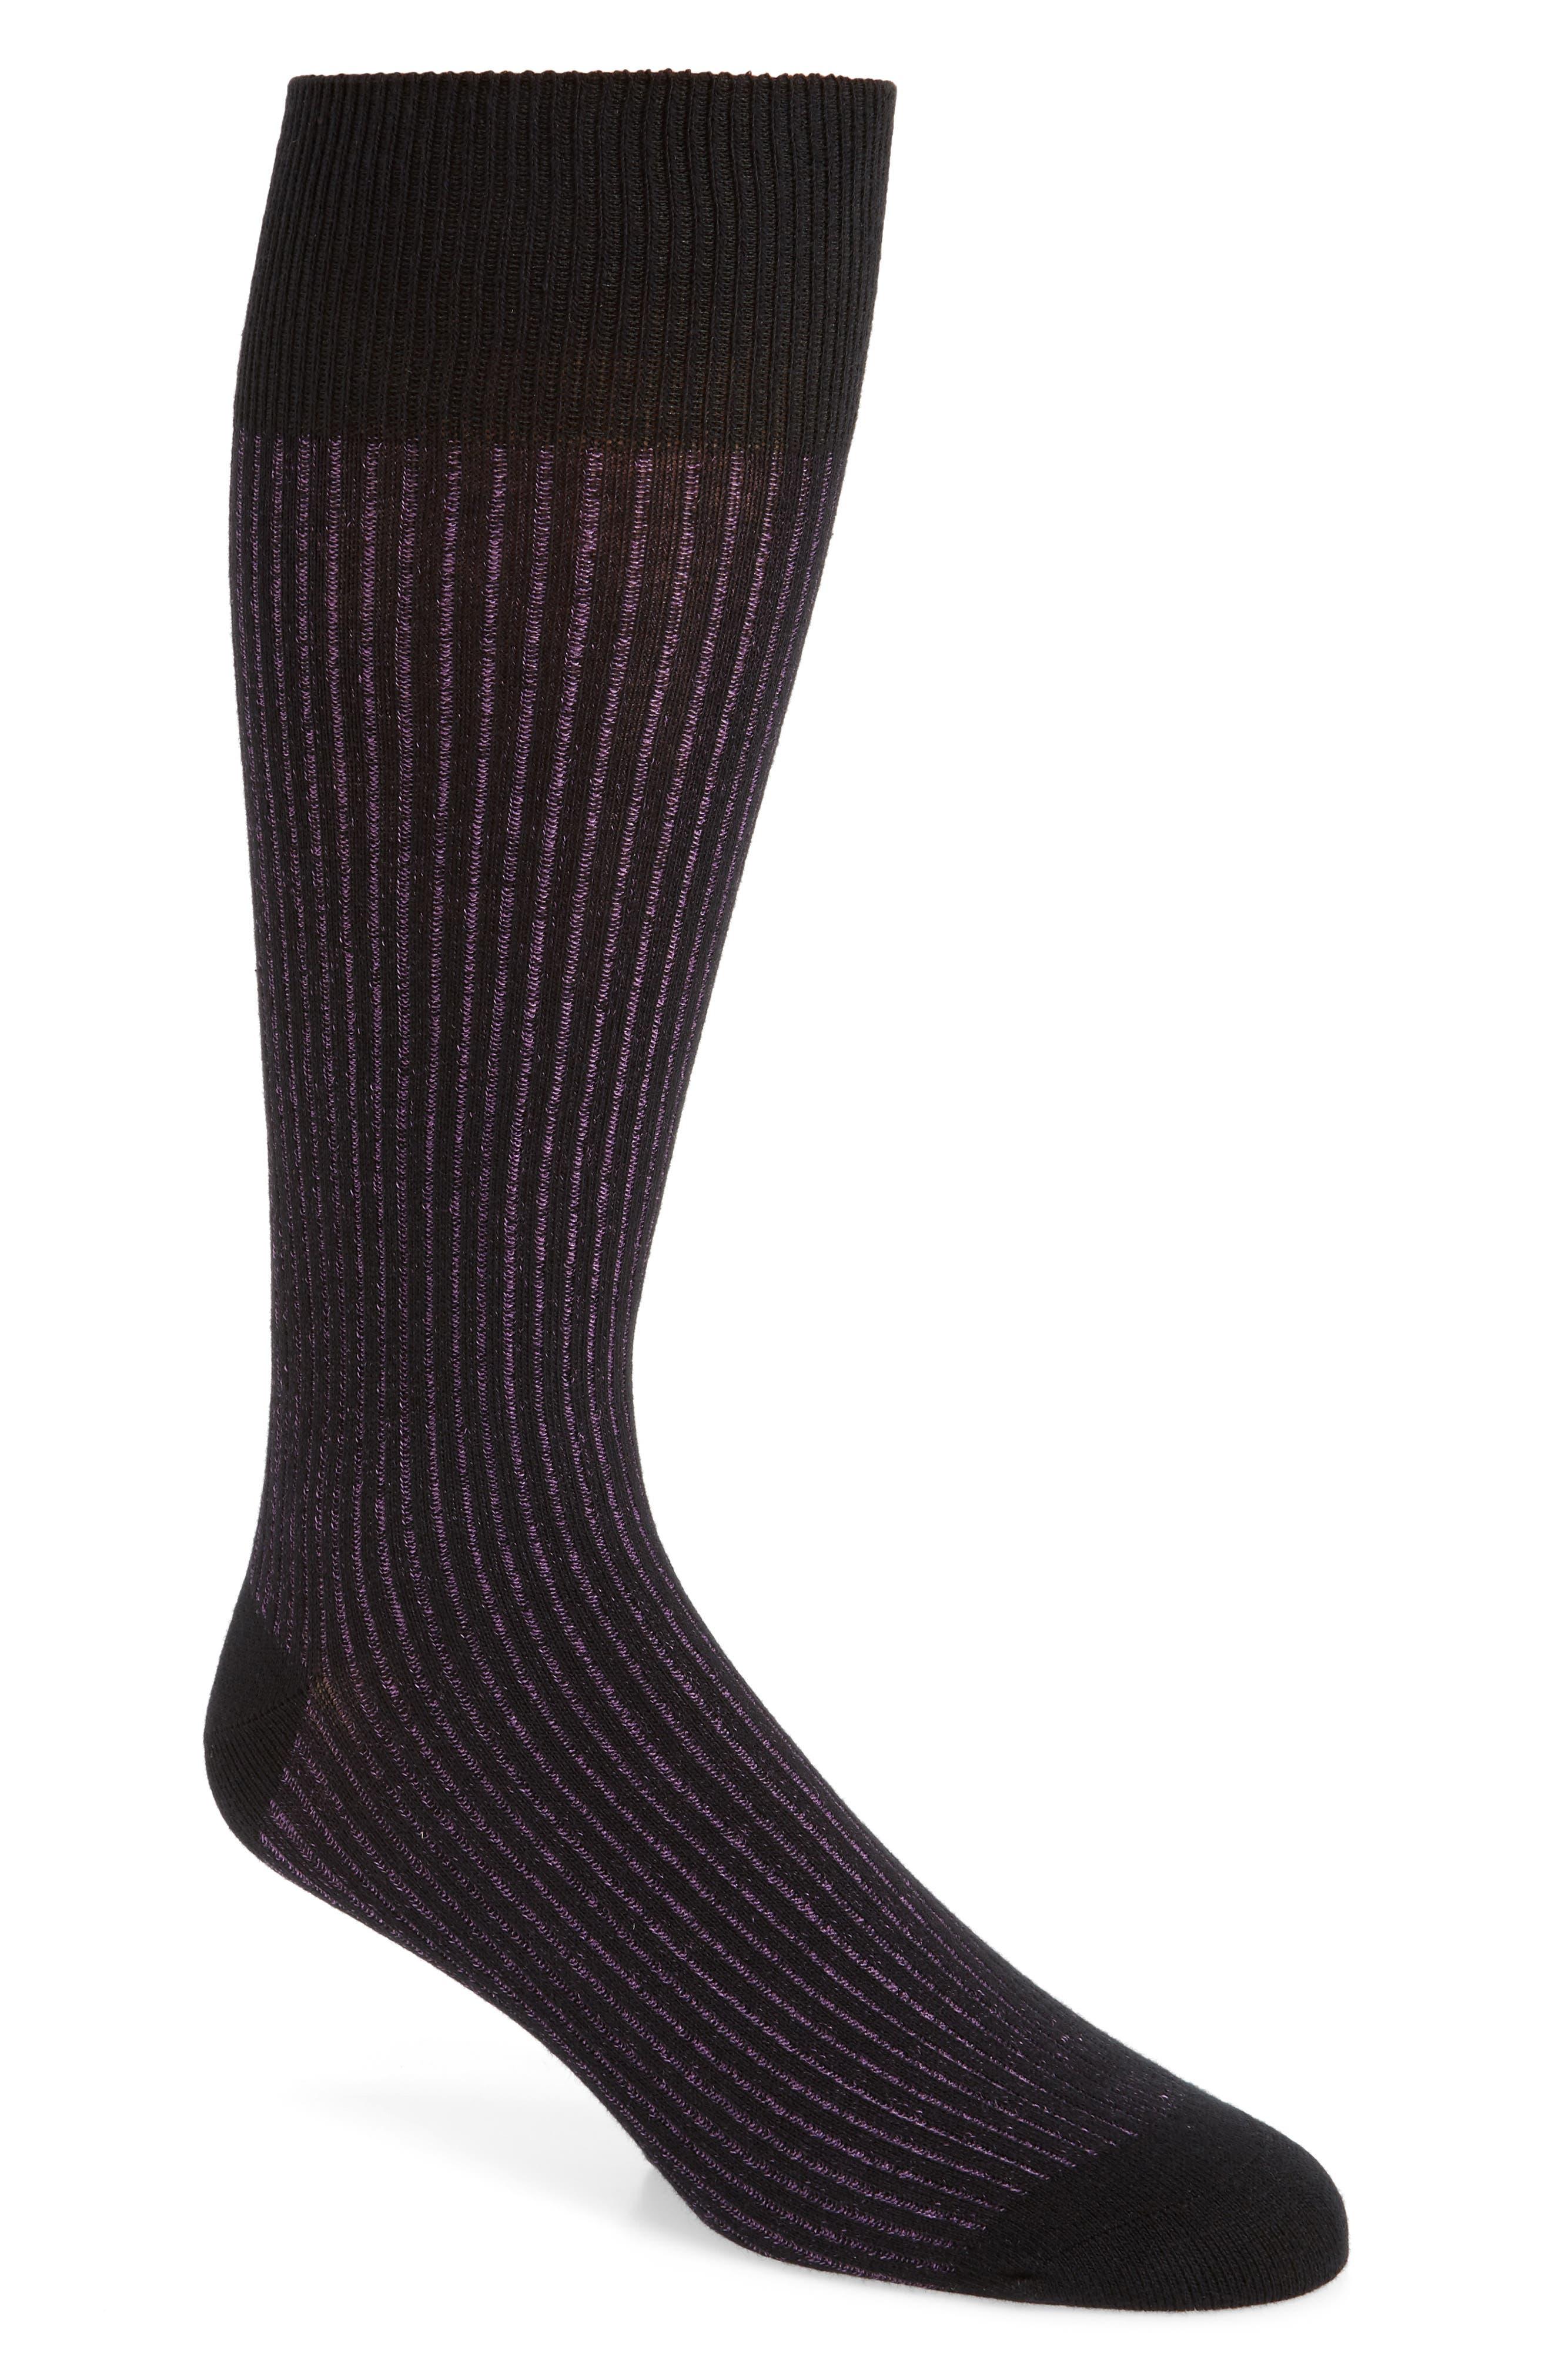 Ribbed Socks,                             Main thumbnail 1, color,                             BLACK/ PURPLE LILY